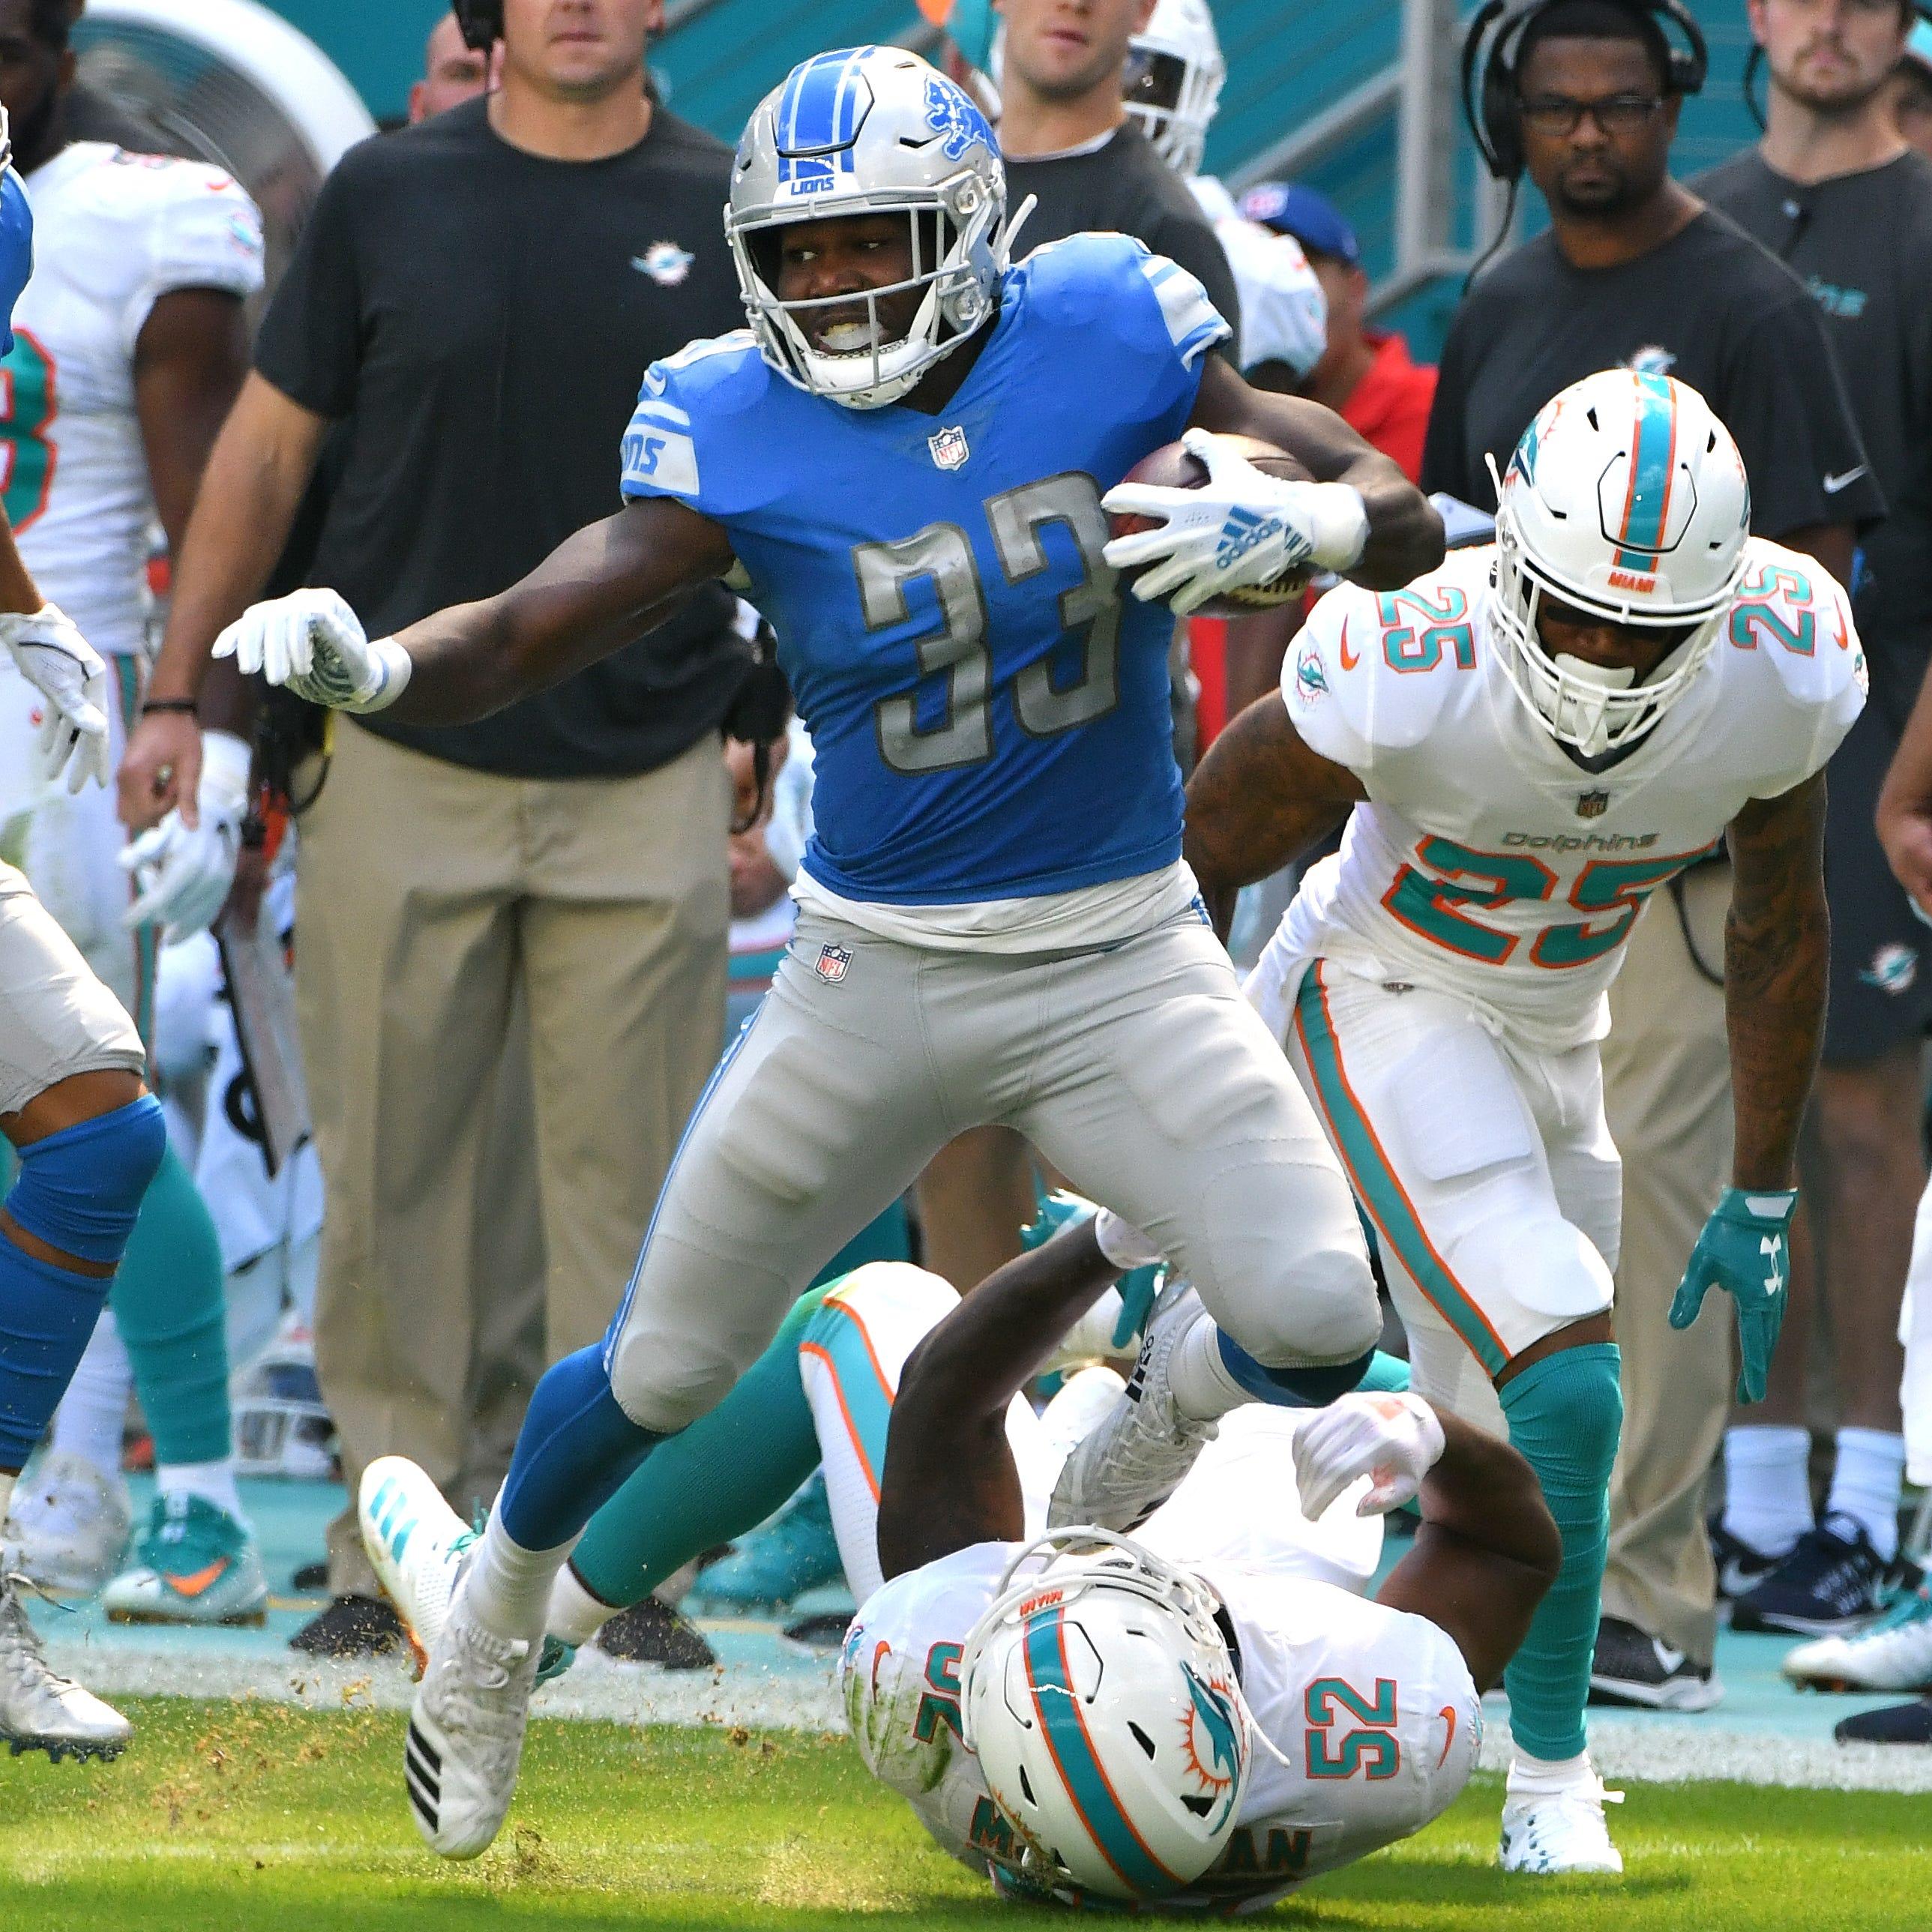 Kerryon Johnson pursues McCaffrey-like impact in Lions' offense